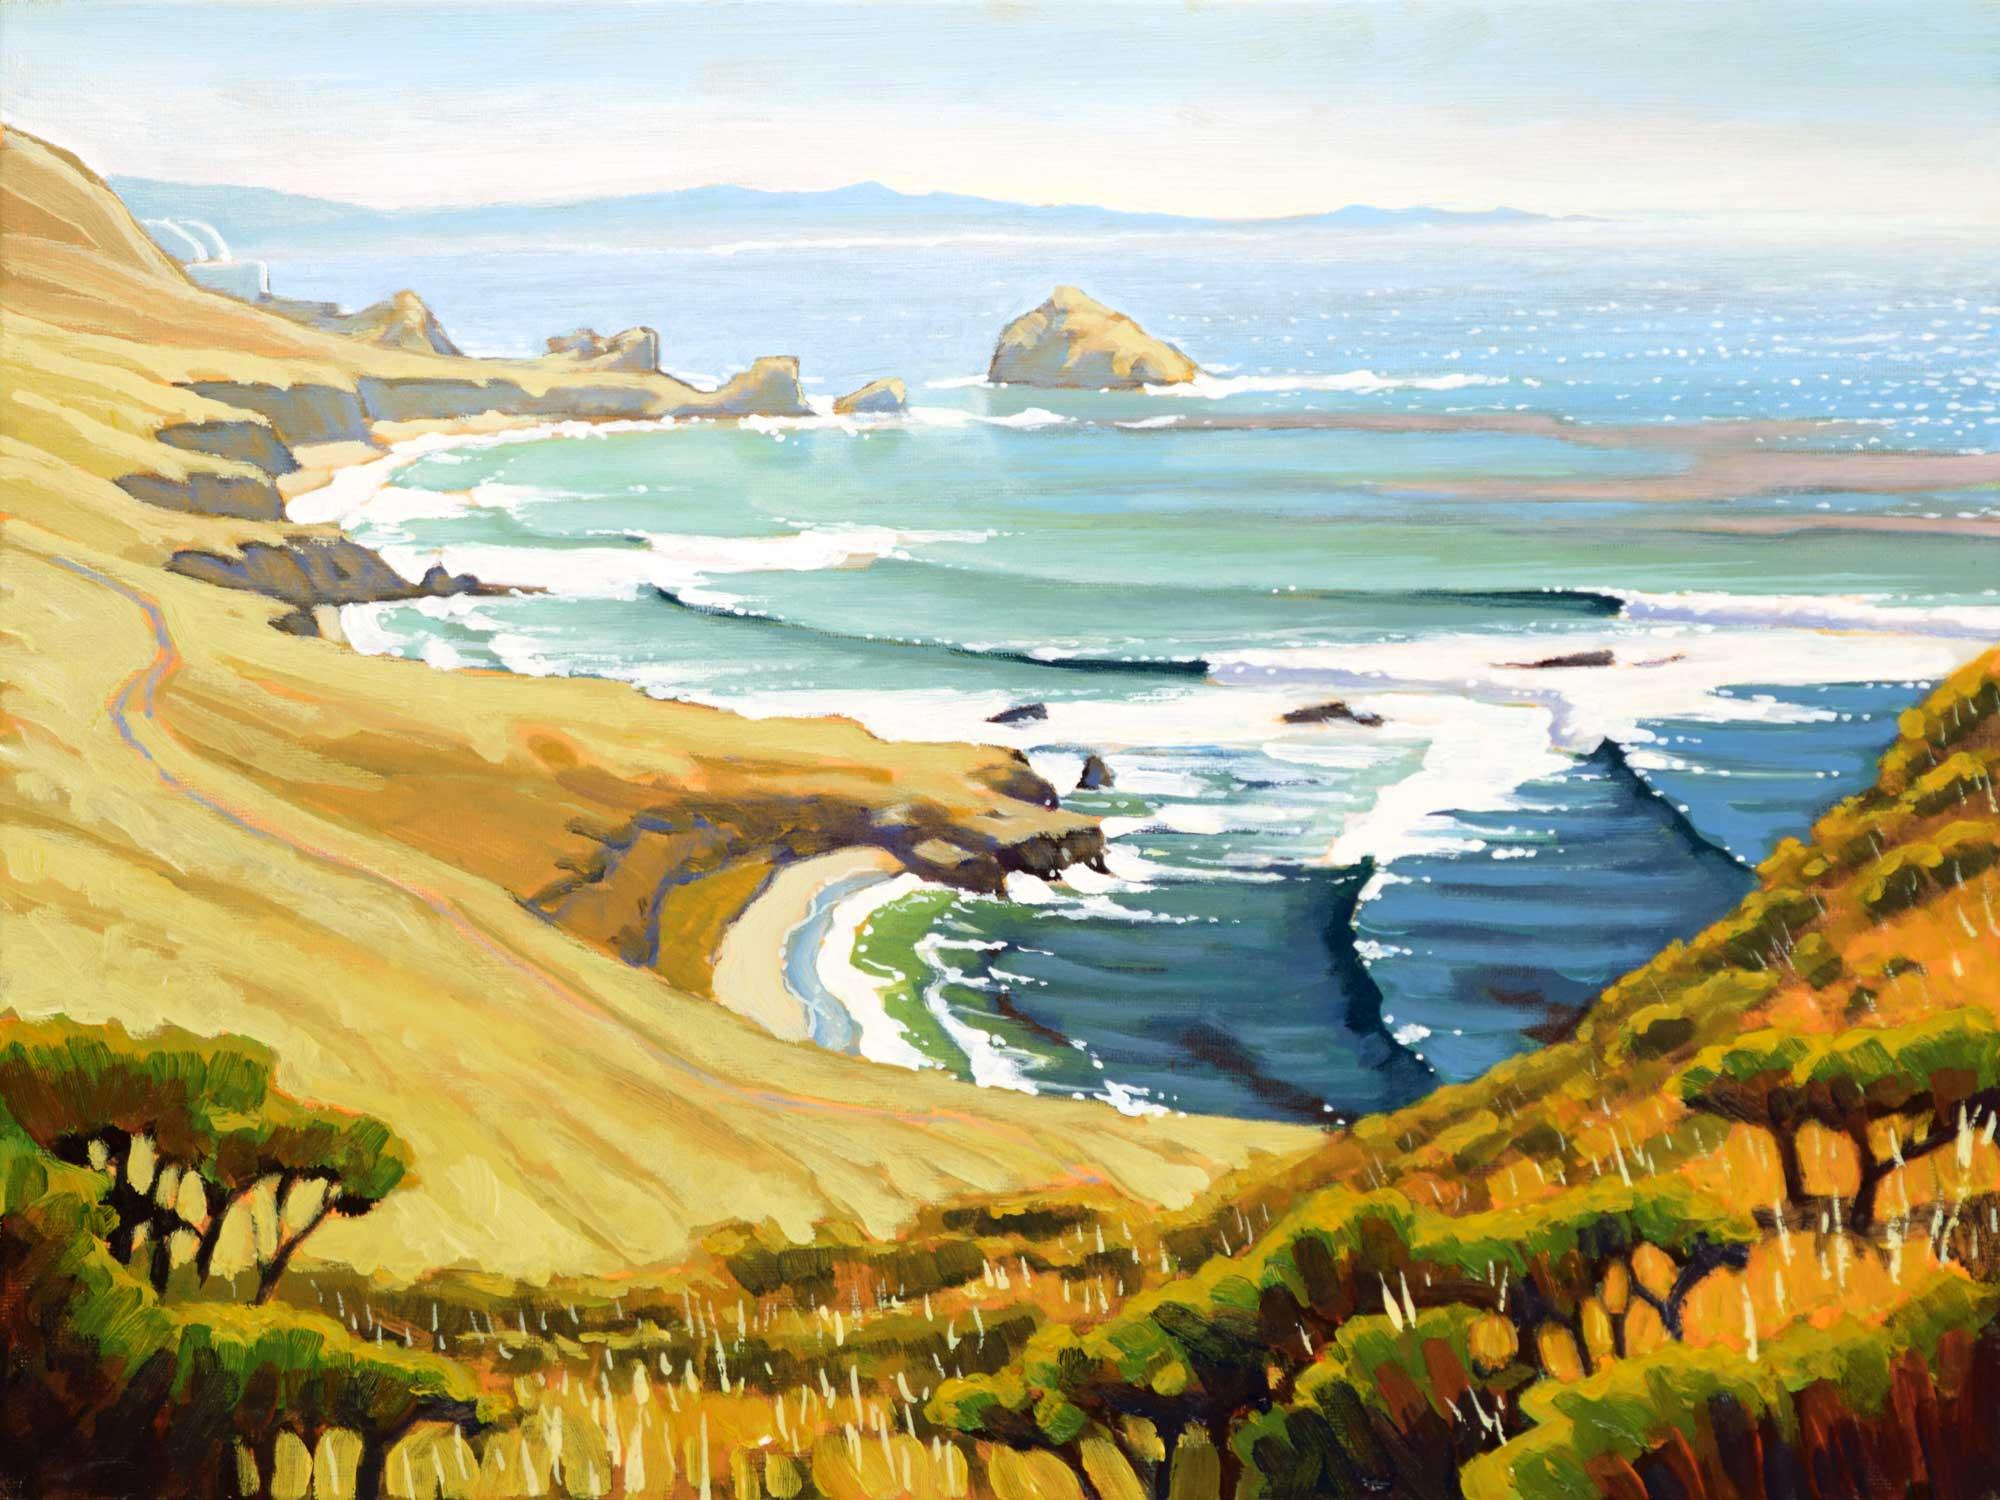 Landscape plein air painting near Point Buchon and Diablo Canyon on the San Luis Obispo county coast of California